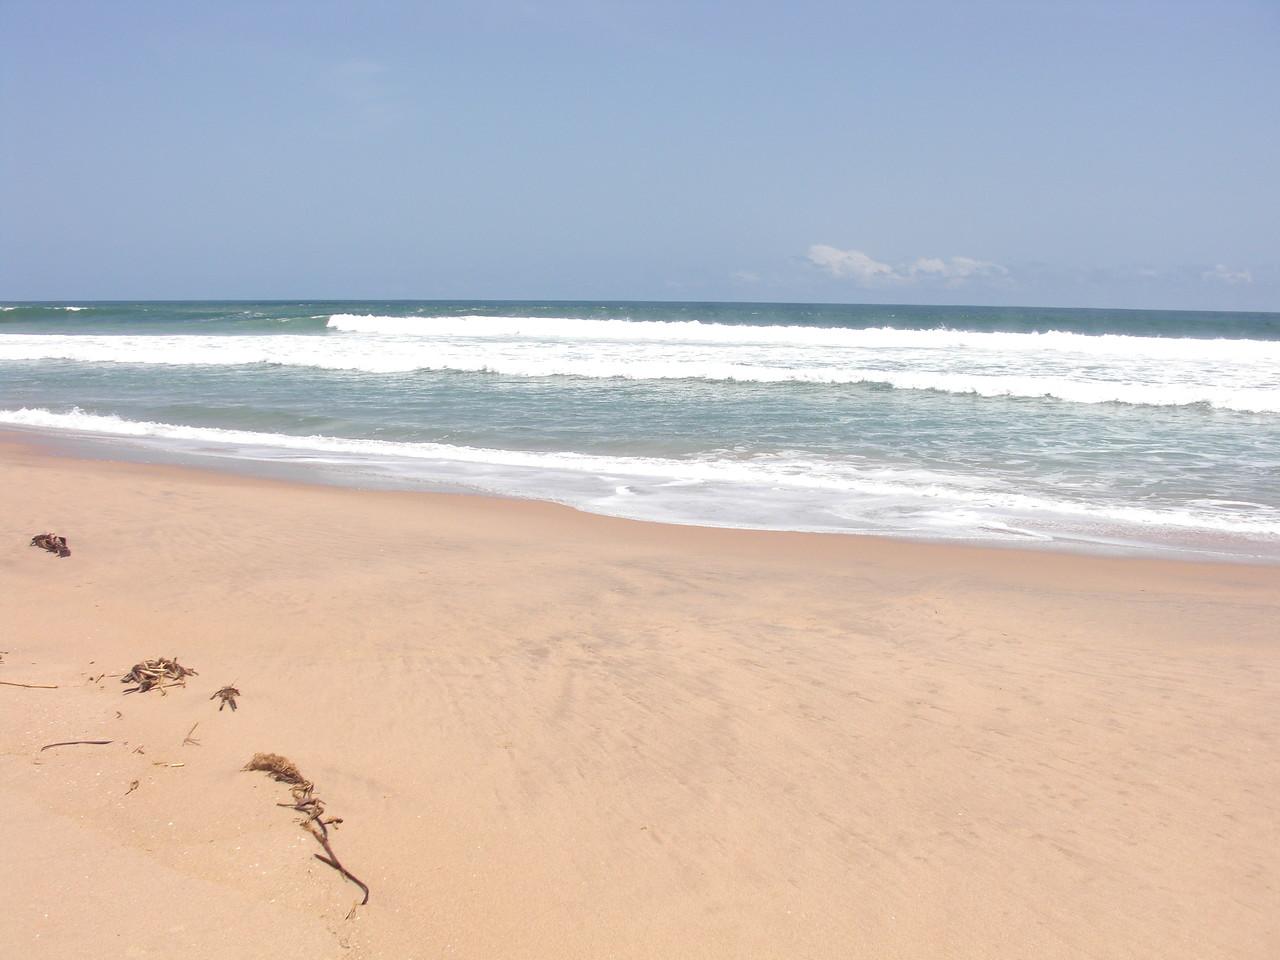 Beach south of Luanda